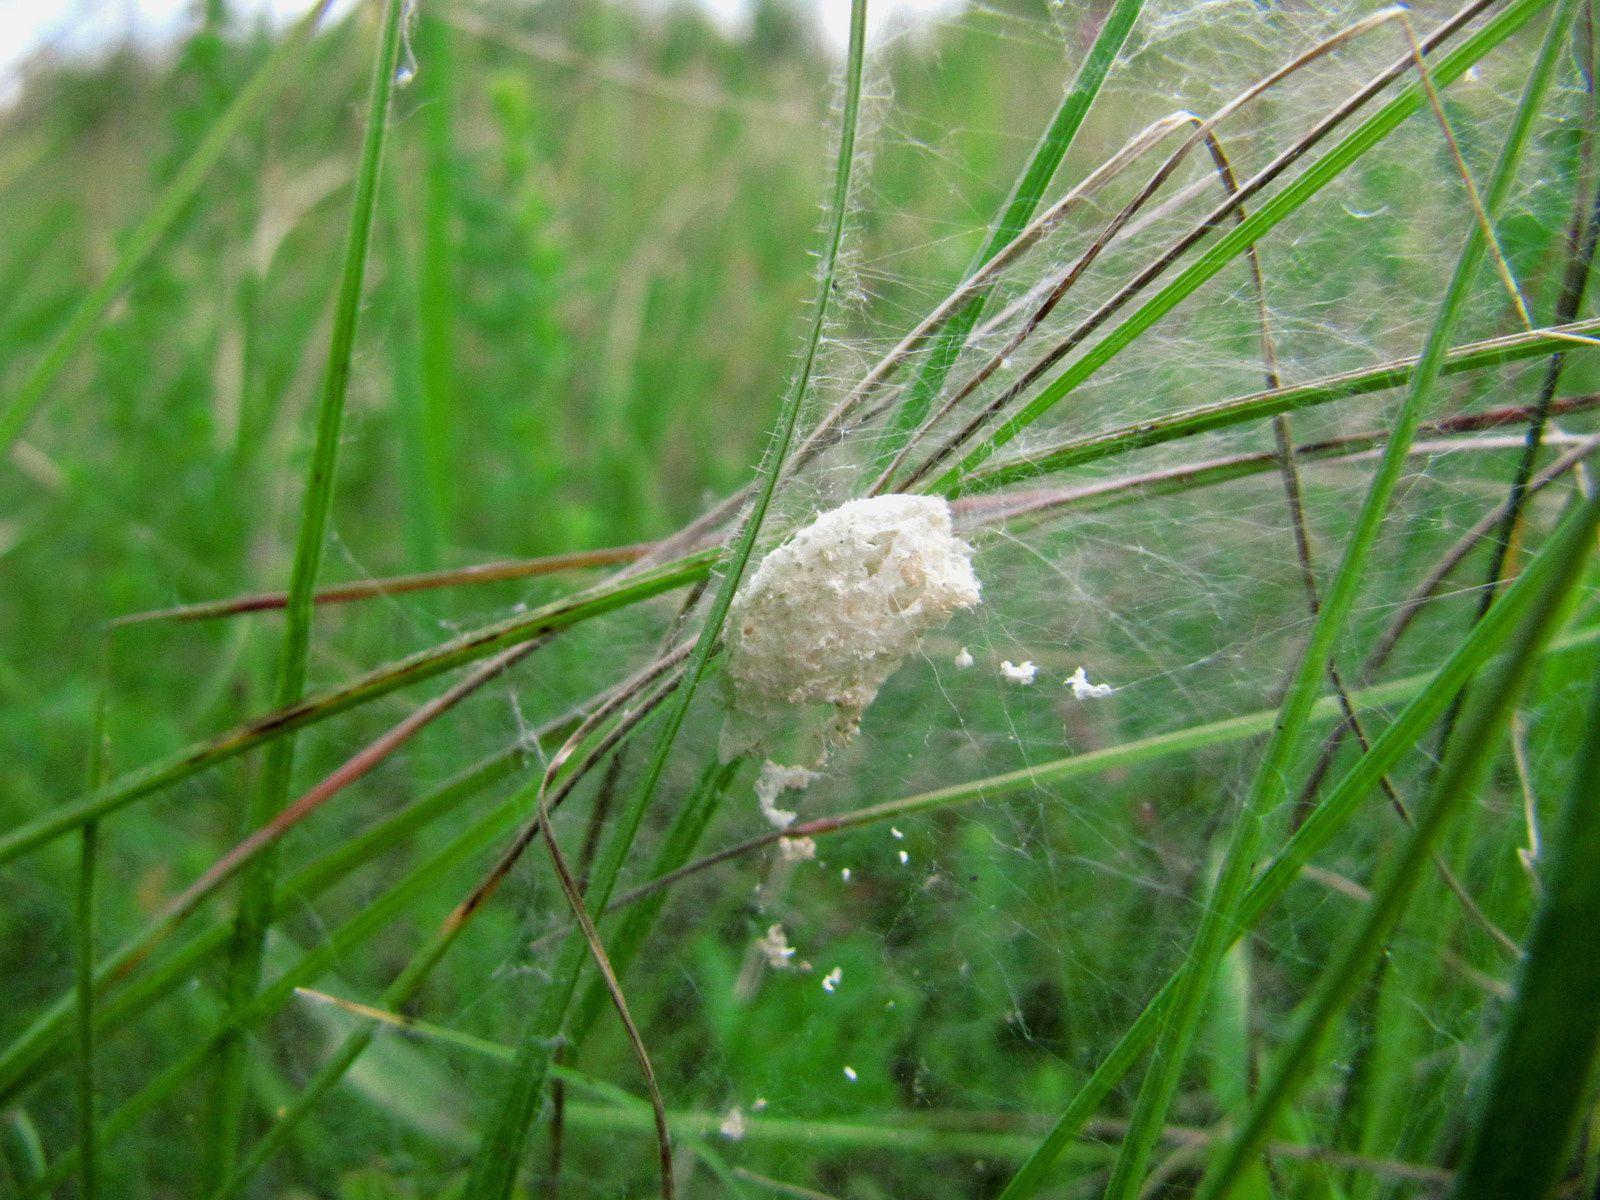 Mangore petite bouteille et son nid ( Mangora acalypha), nid de pisaure admirable (Pisaura mirabilis)